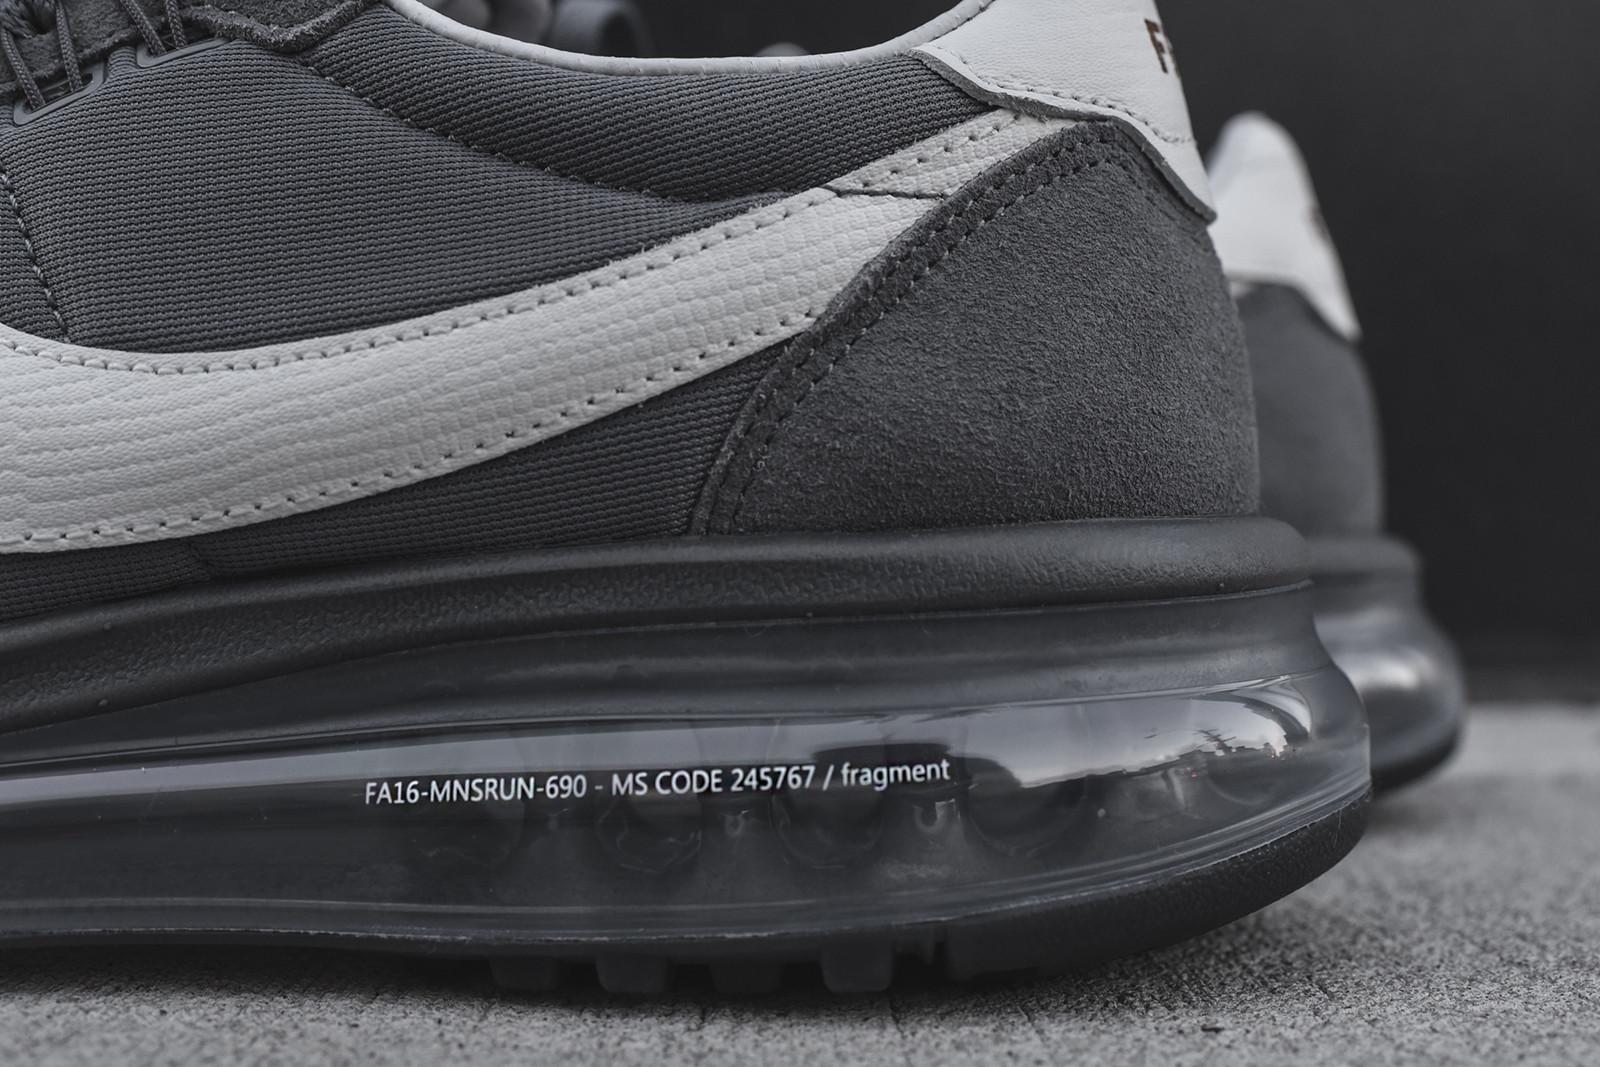 Fragment Nike Air Max LD Zero 885893-002 Detail